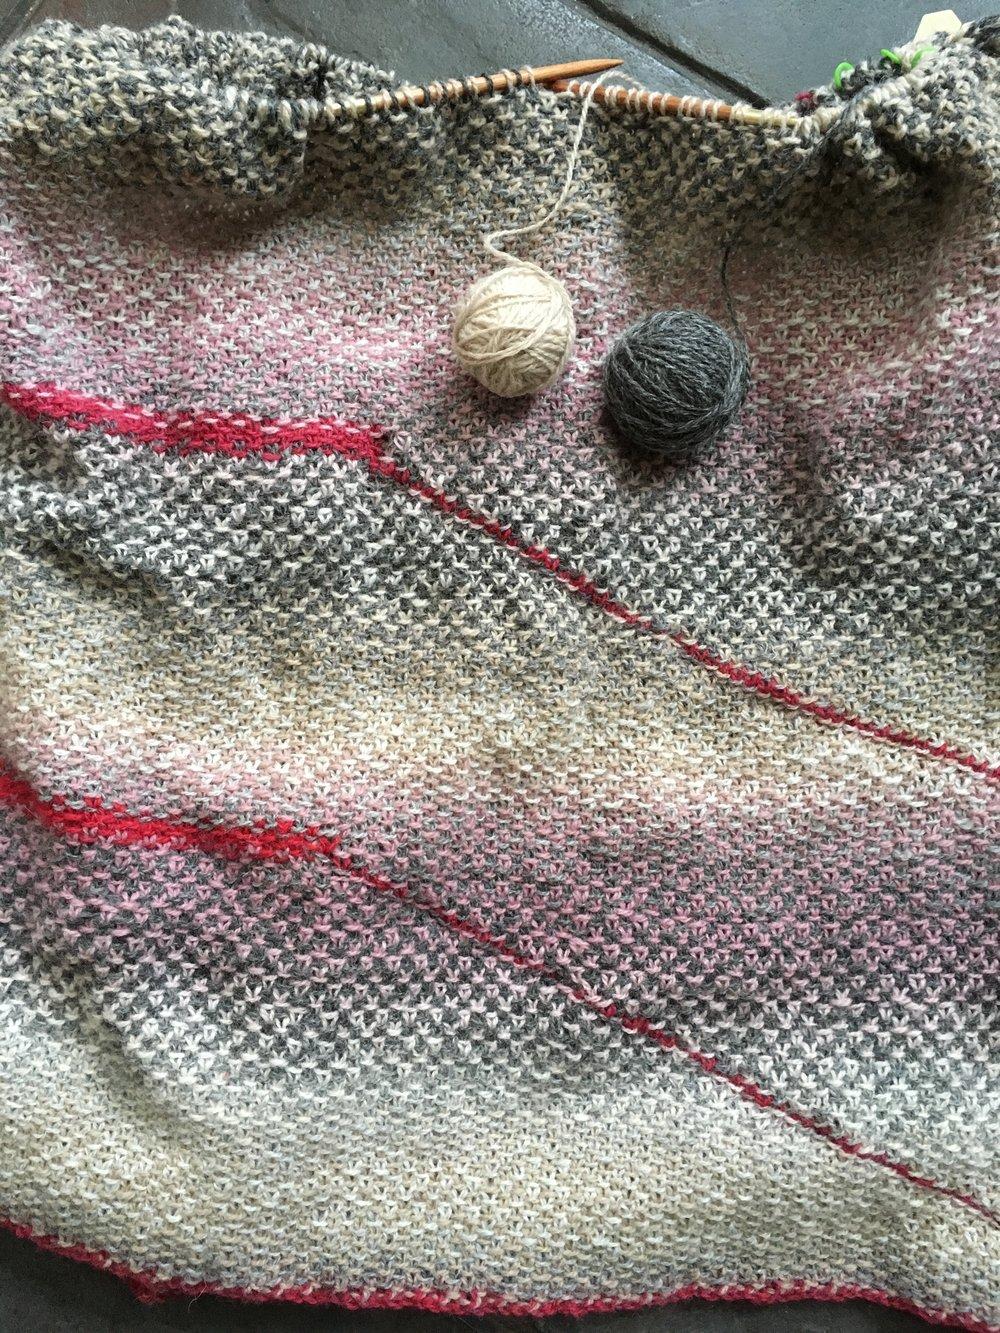 Yarn: Kauni Effekt, fingering weight, colors EHA (grays), EJ (pink/mauve/beige), and EME (reds)